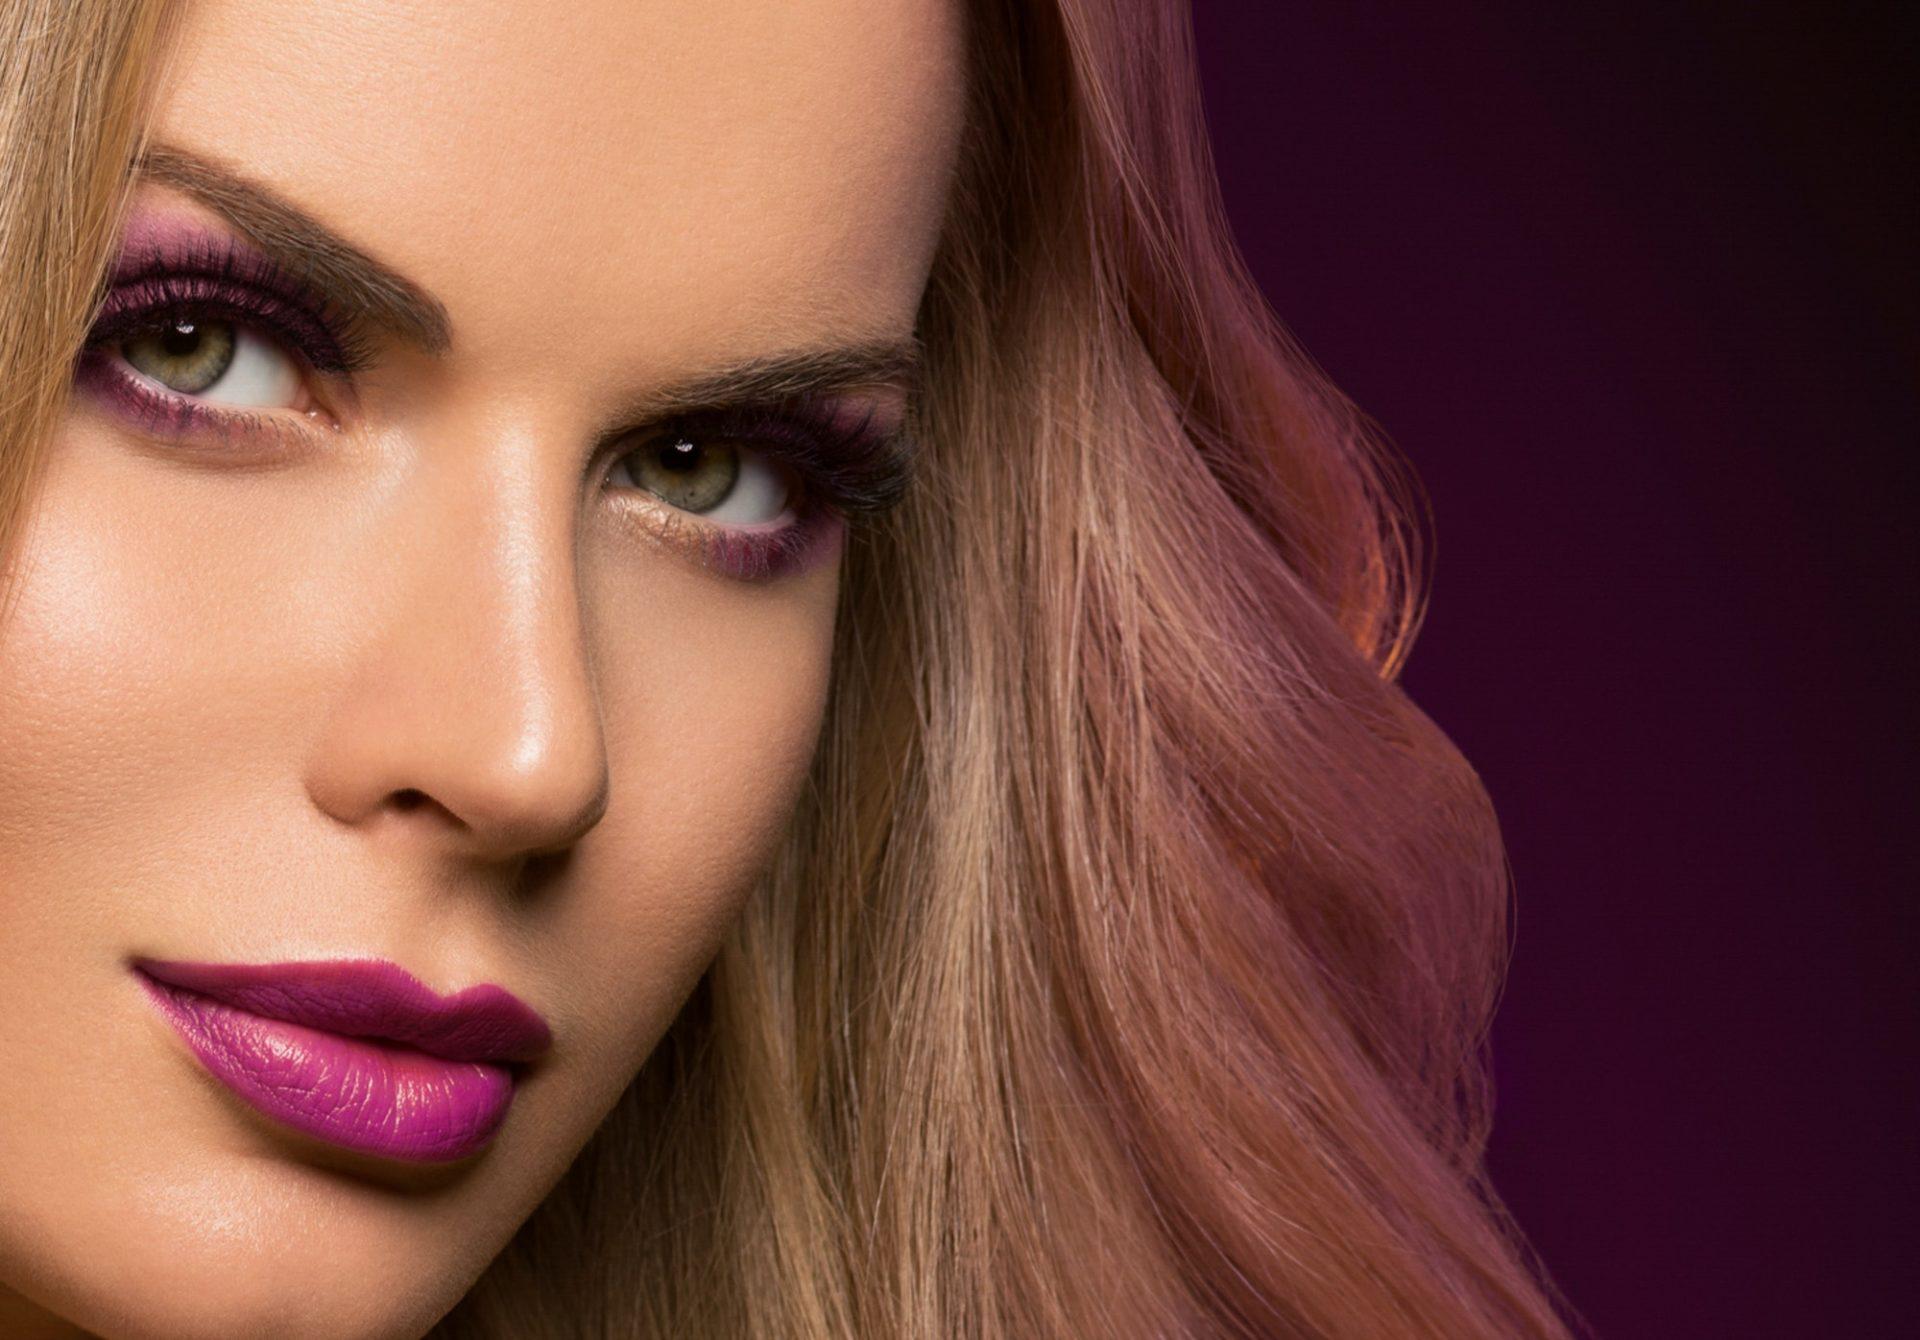 beautiful-blonde-woman-hairstyle-long-smooth-curly-hair-fashion-makeup.jpg